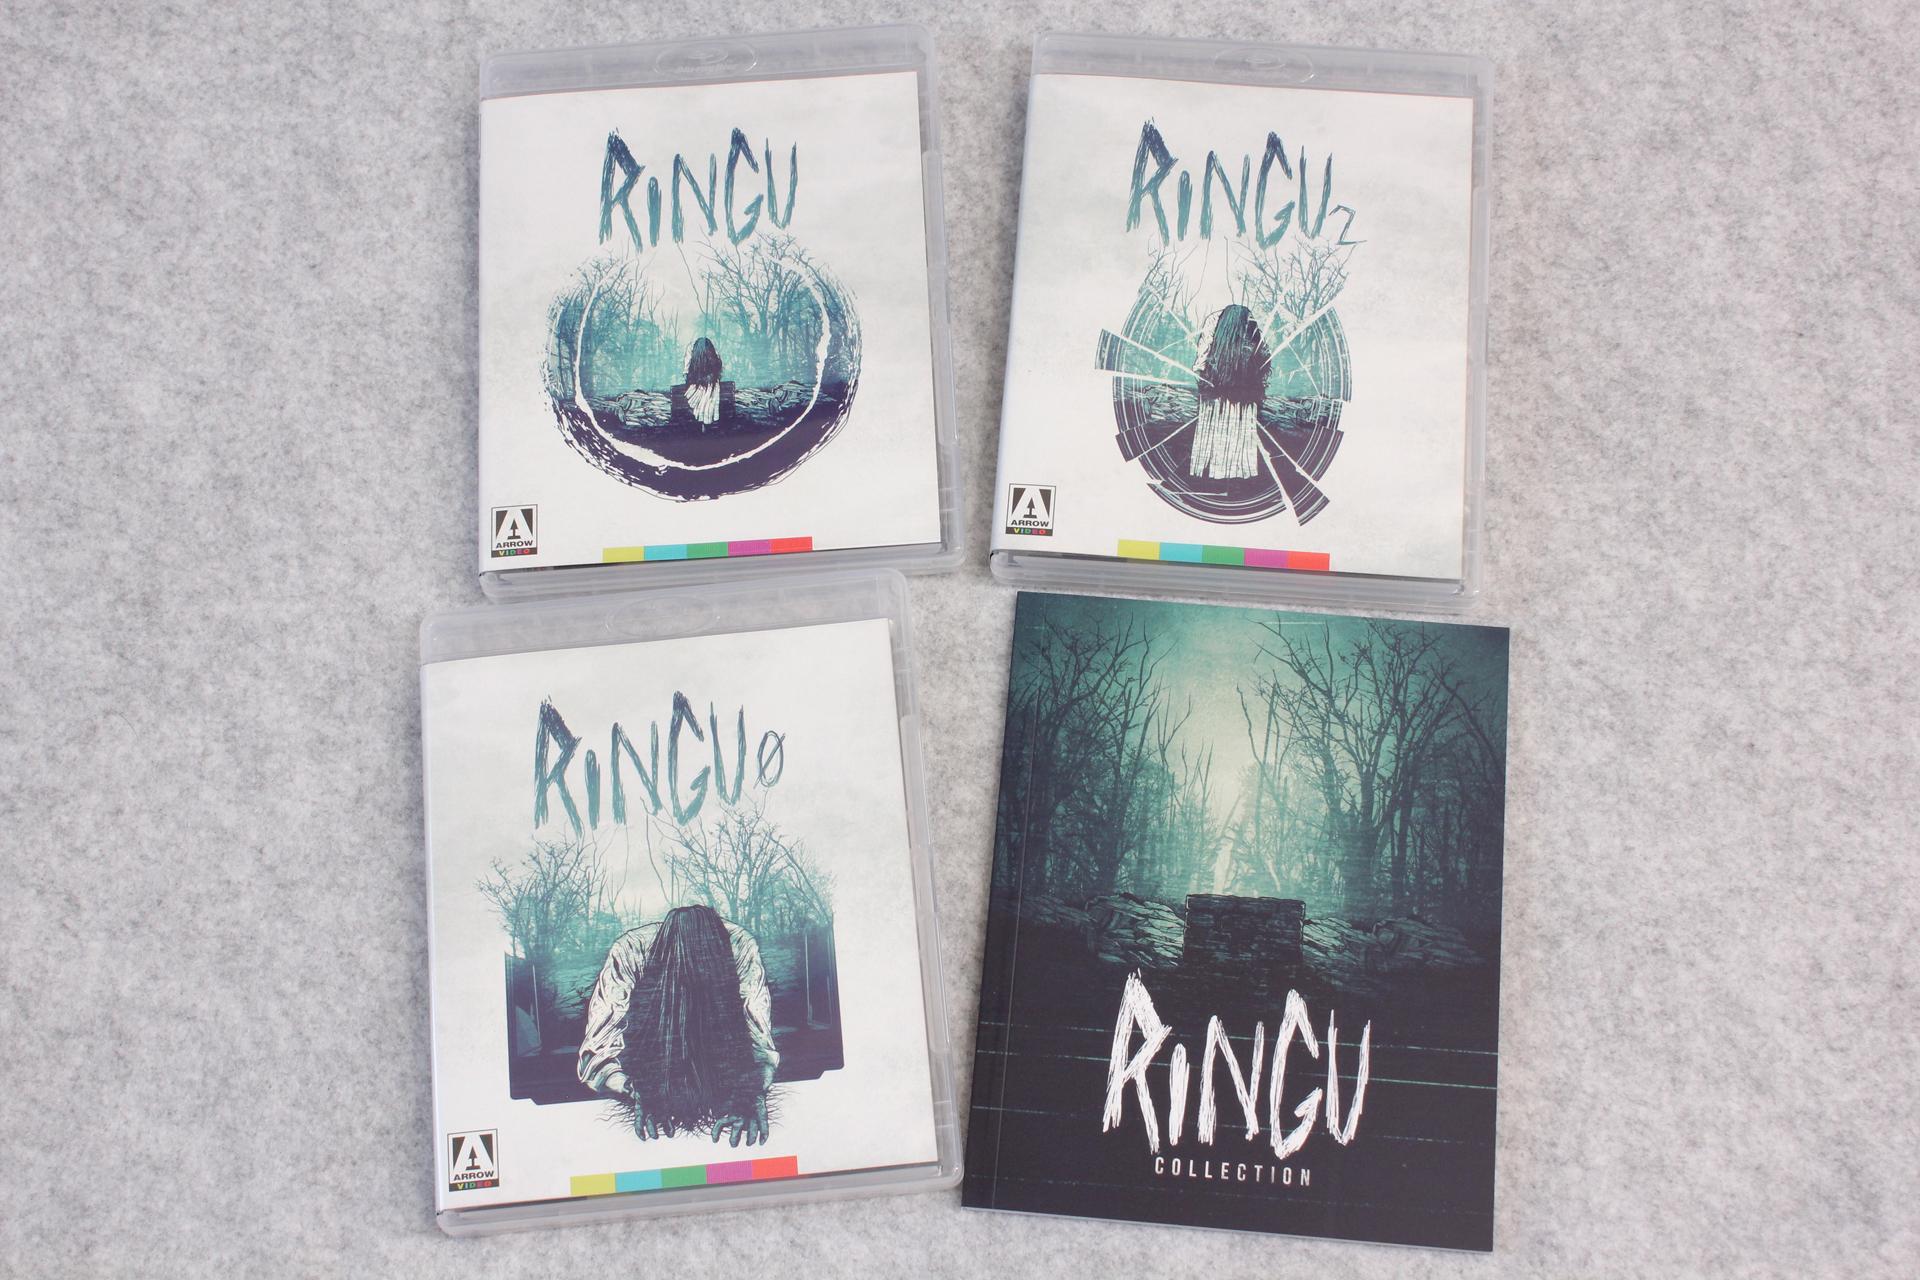 2019-11-16-Ringu_Collection_USBD-5.JPG